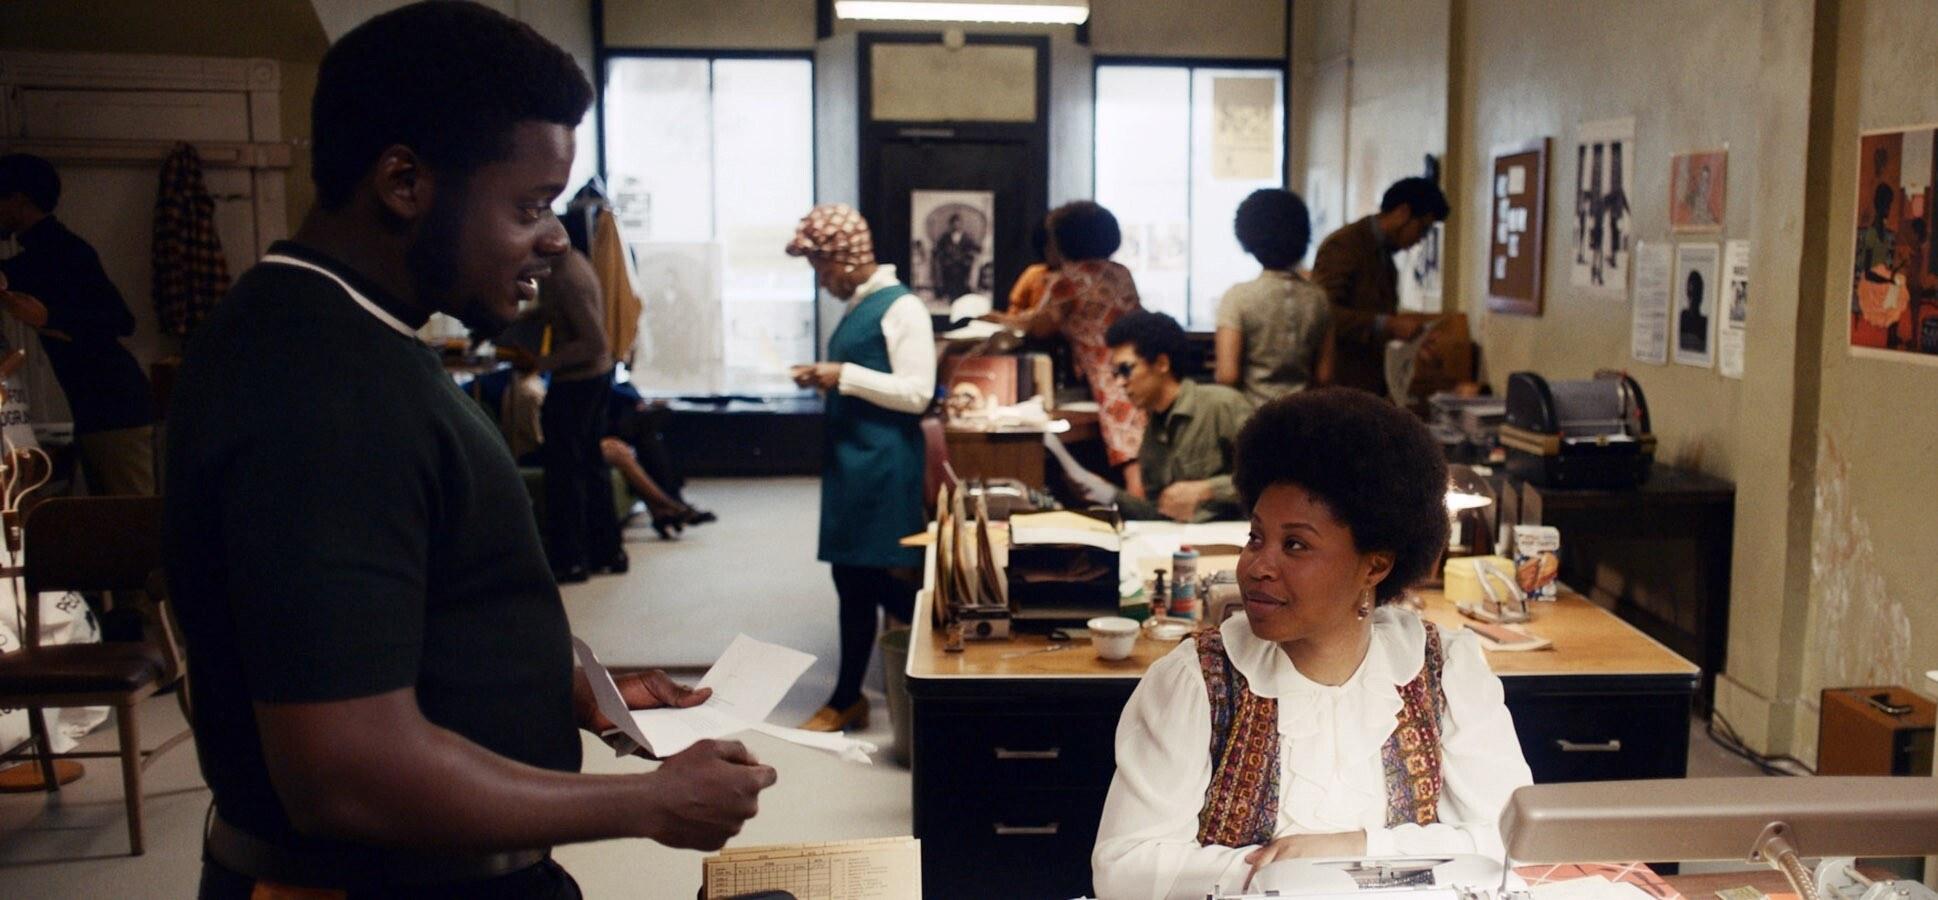 Daniel Kaluuya as Fred Hampton talking to Dominique Fishback as Deborah Johnson in Judas and the Black Messiah